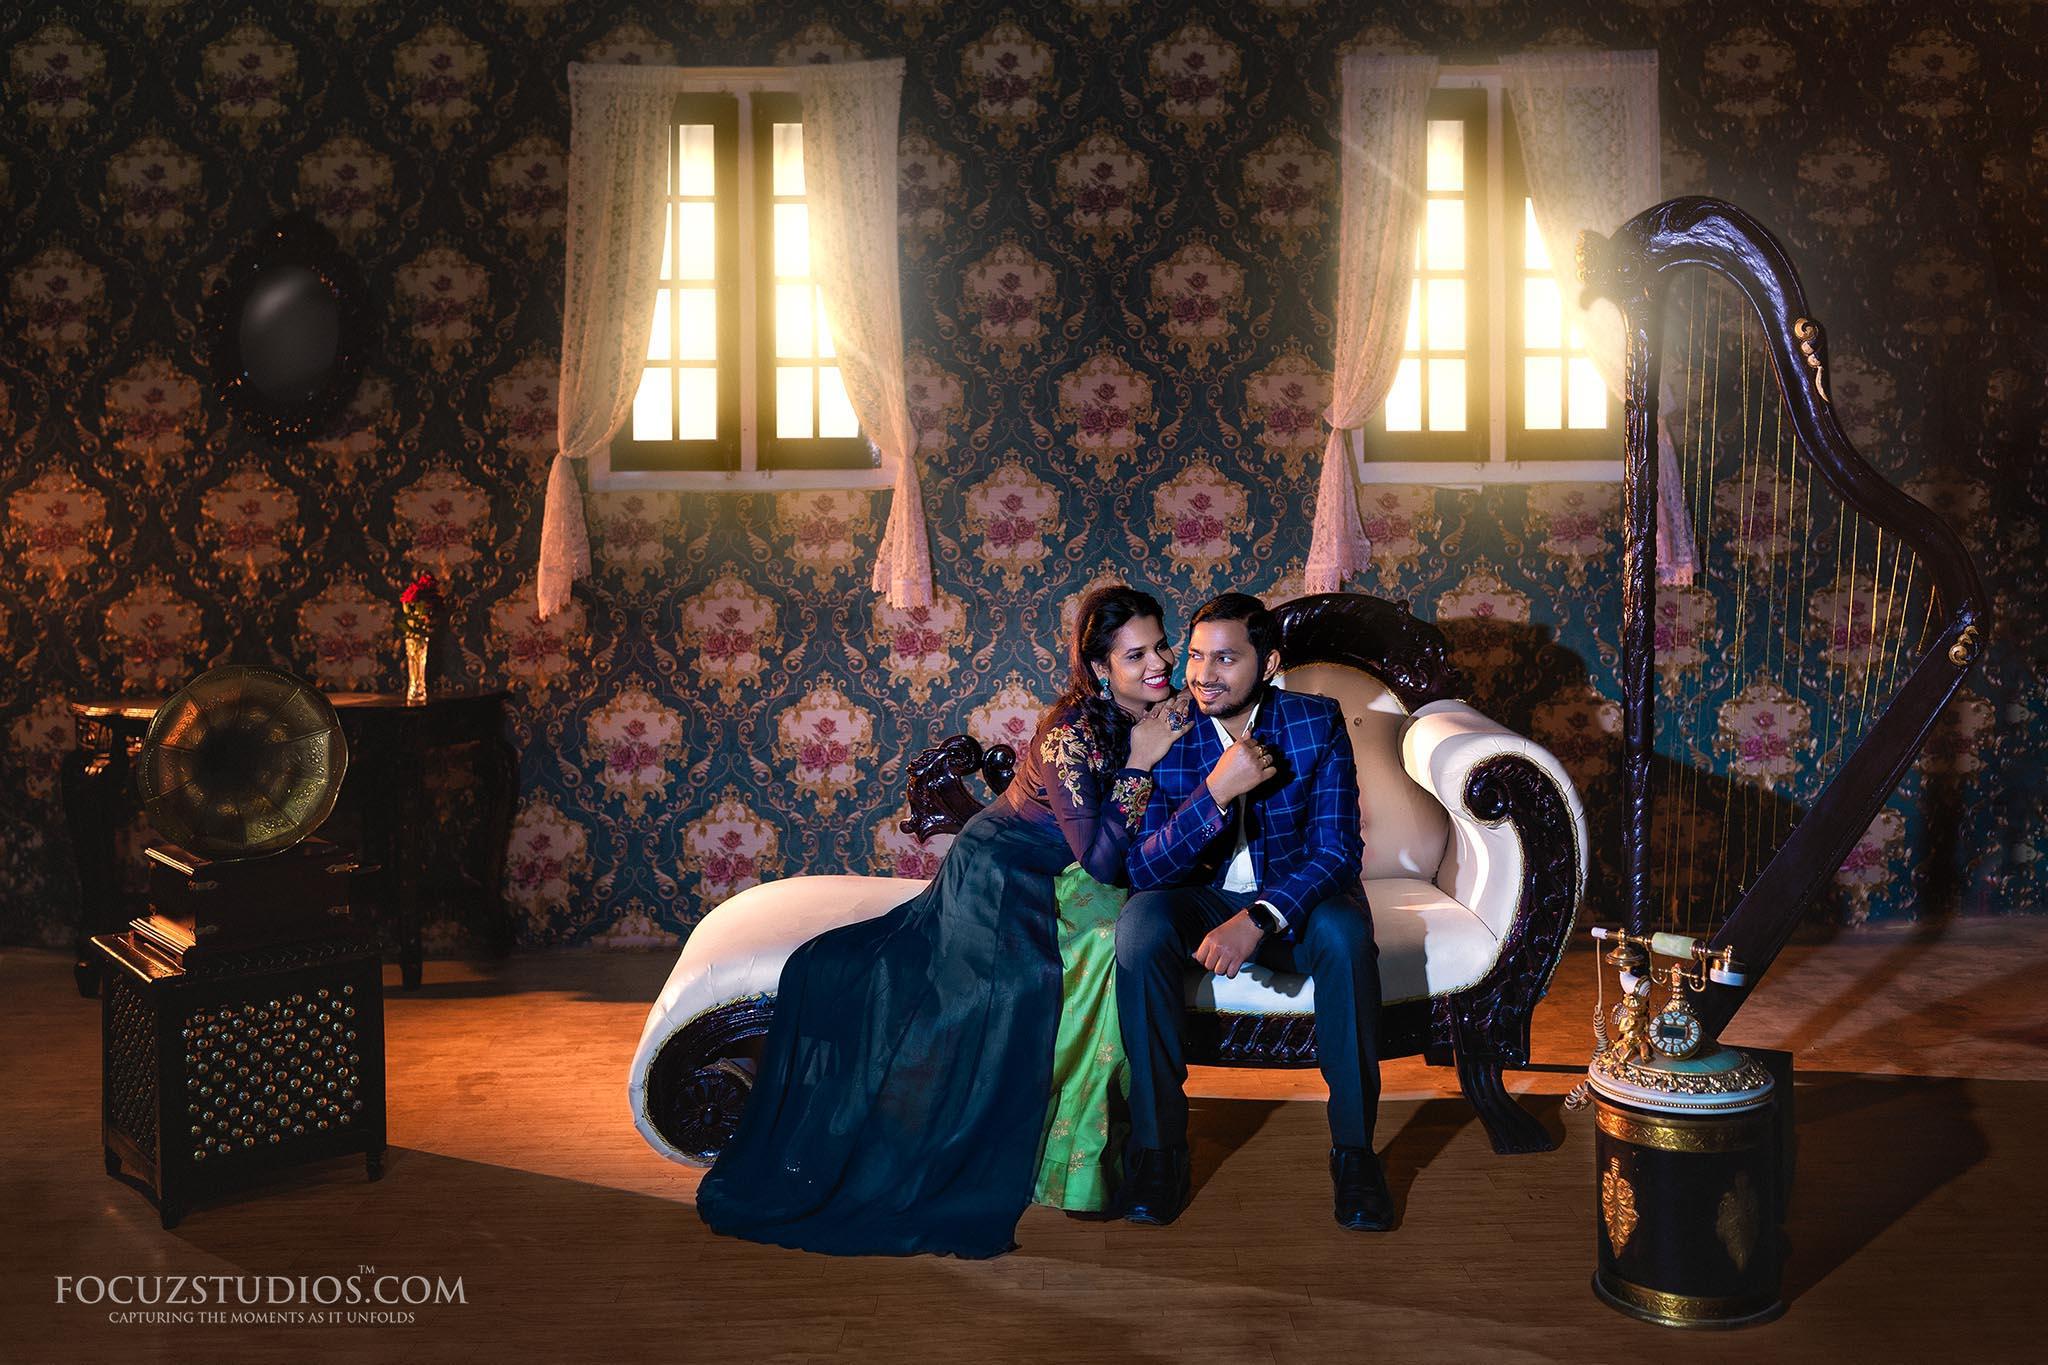 PicturesQ-Studio-focuz-studio-hyderabad-pre-wedding-shoot-3